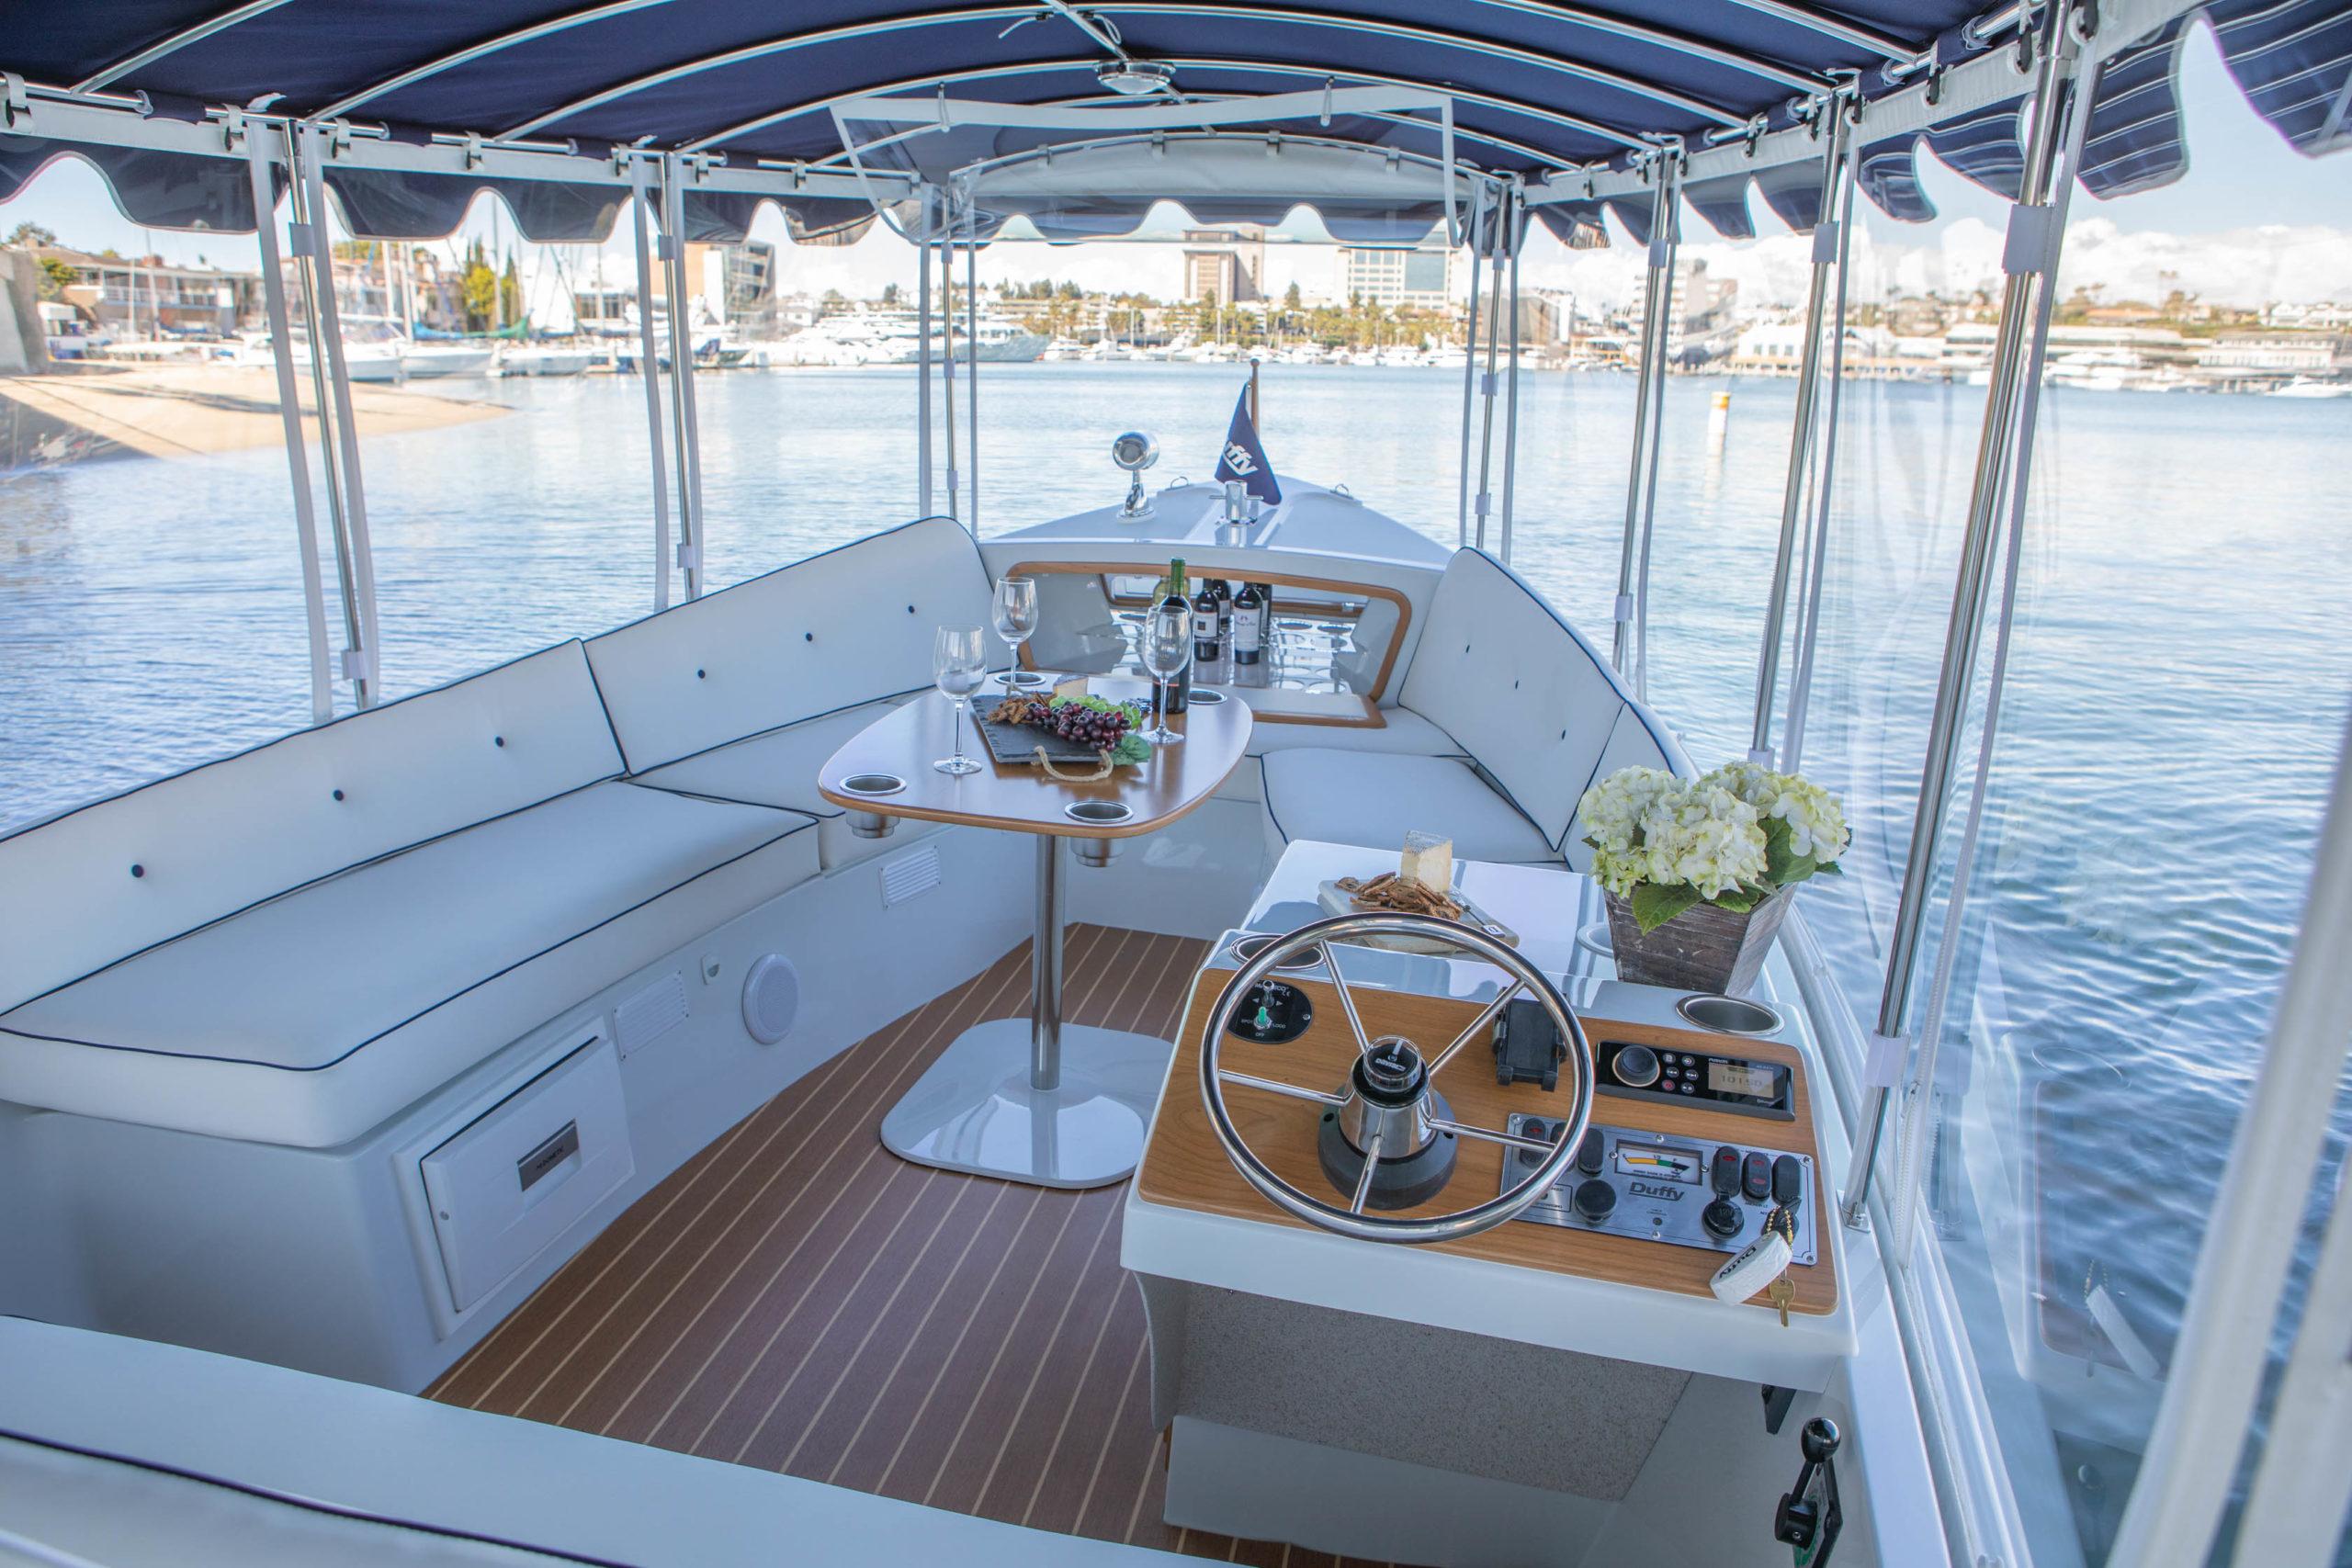 Interior photo of 2020 Duffy Electric Boat 22 Sun Cruiser.